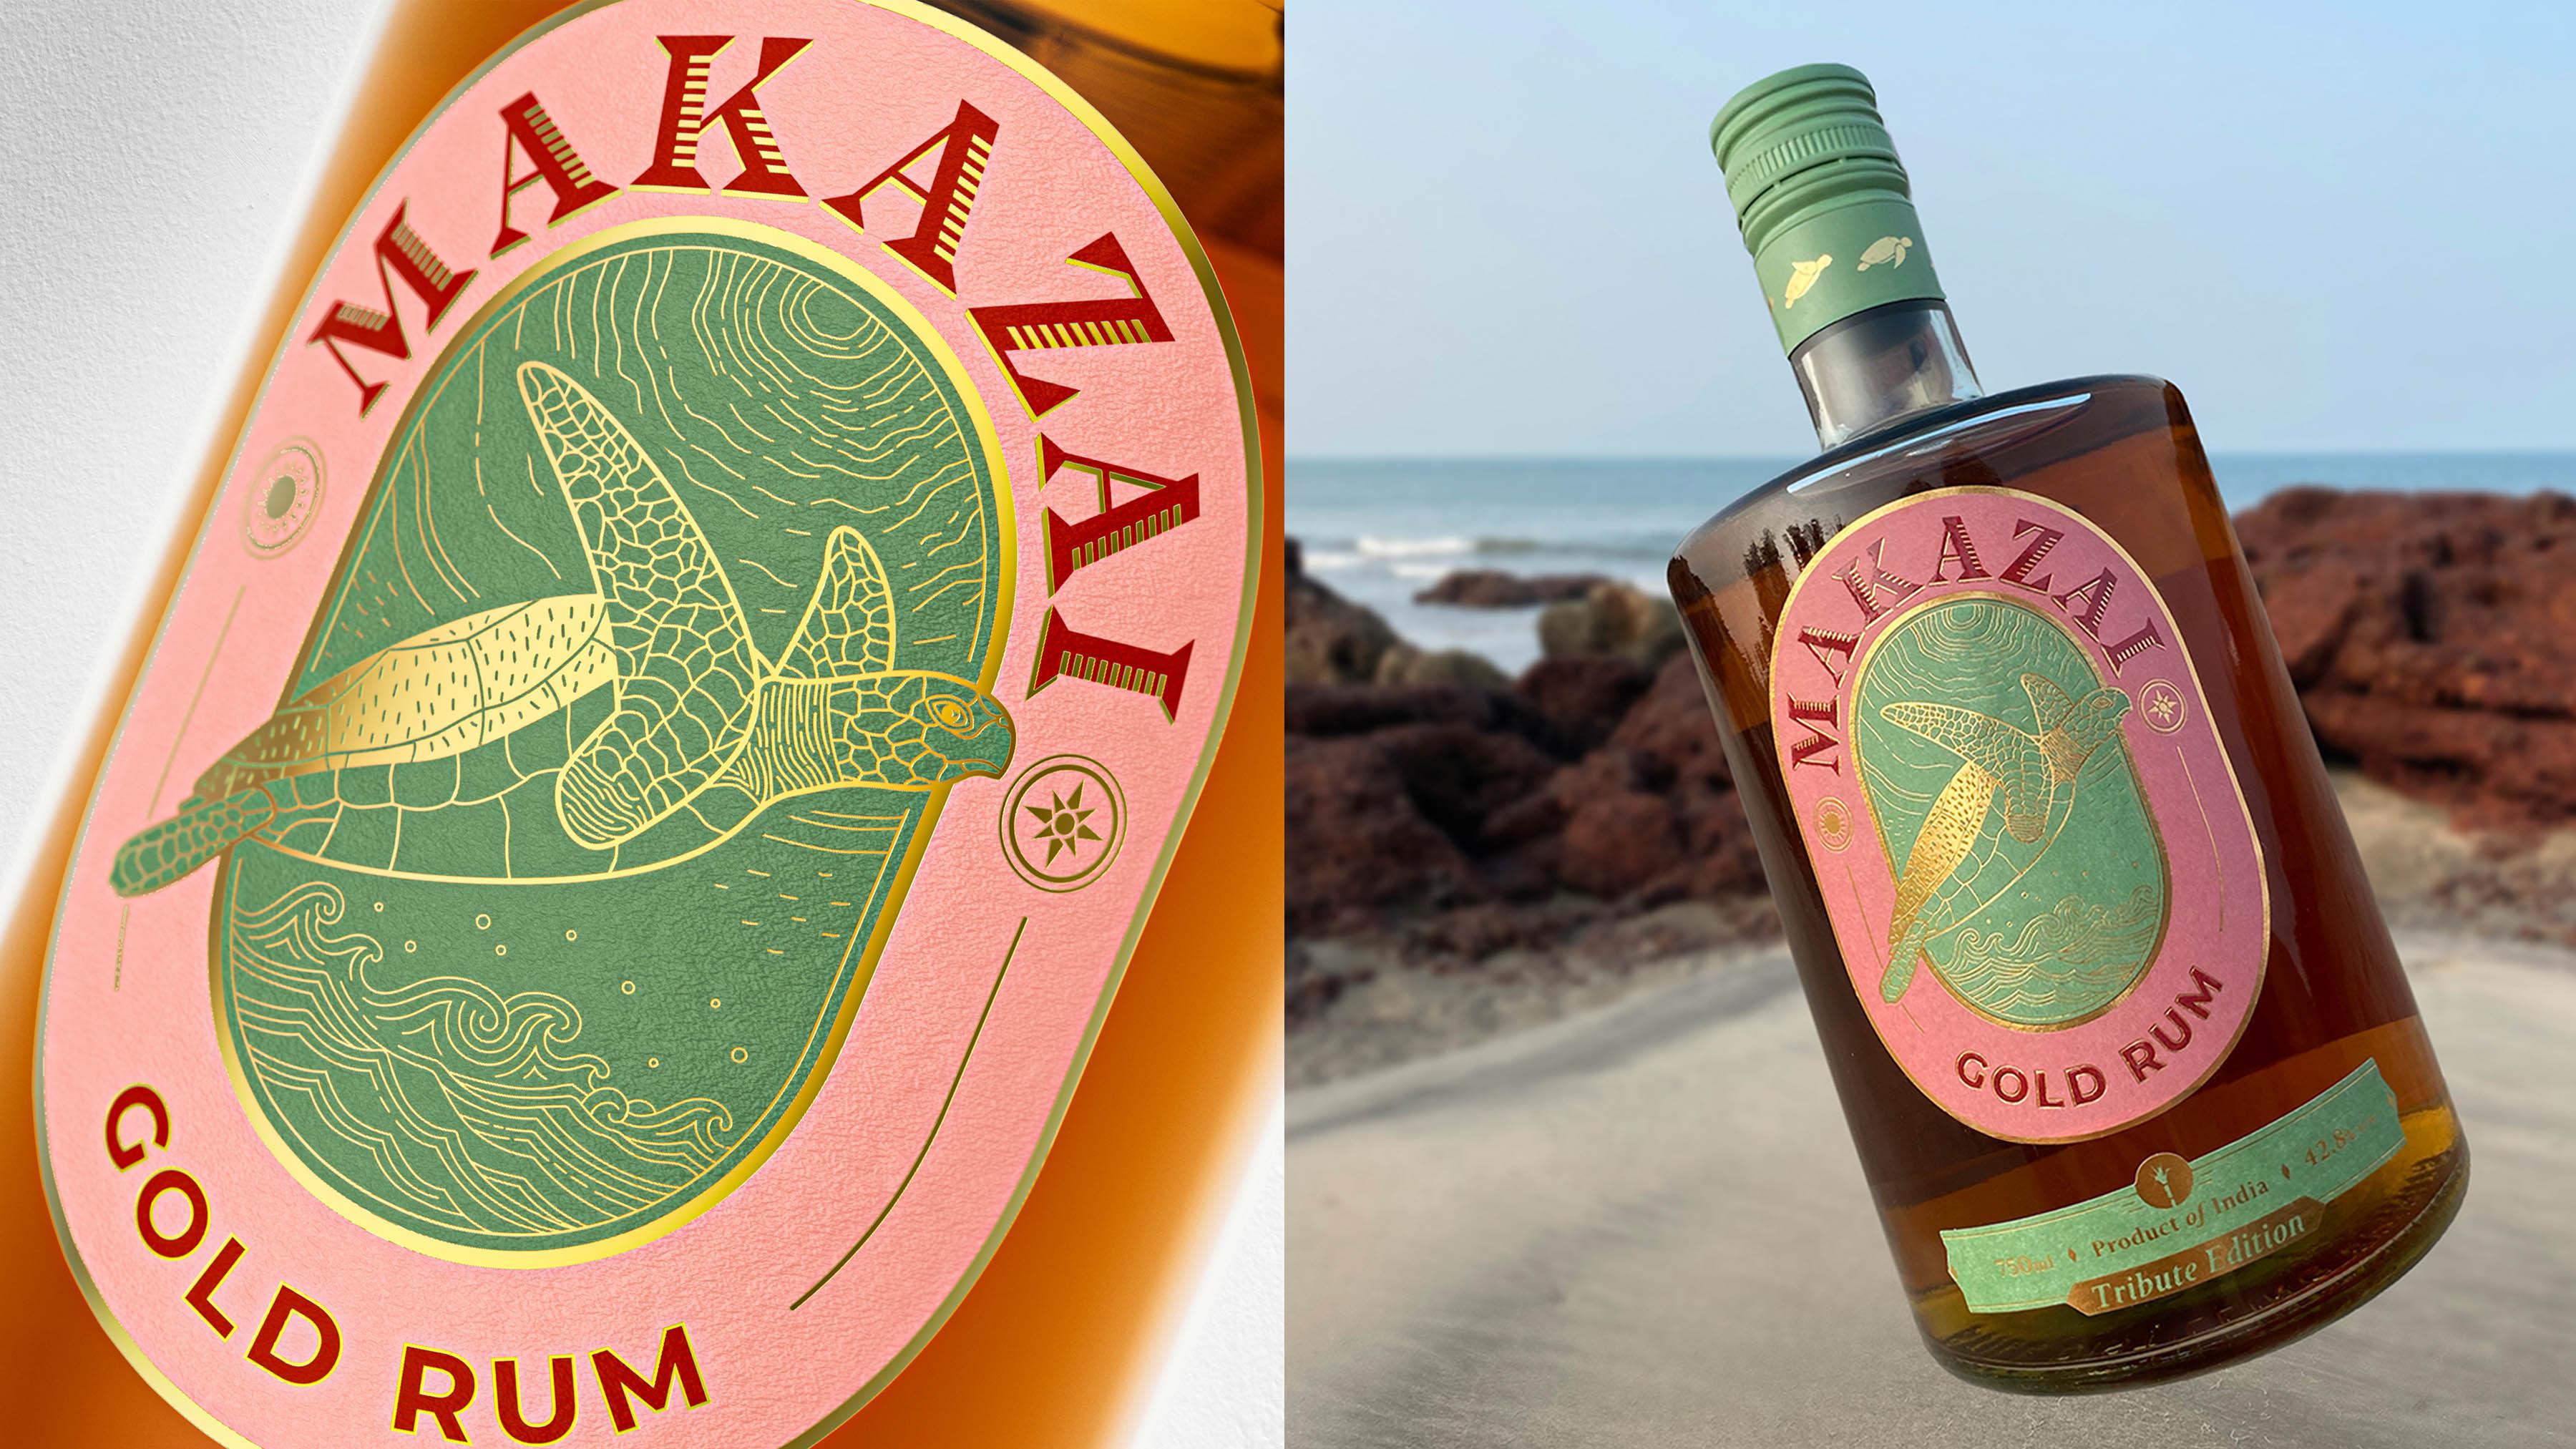 Popping Mustard Designs India's Homegrown Craft Rum Maka Zai from Stilldistilling Spirits